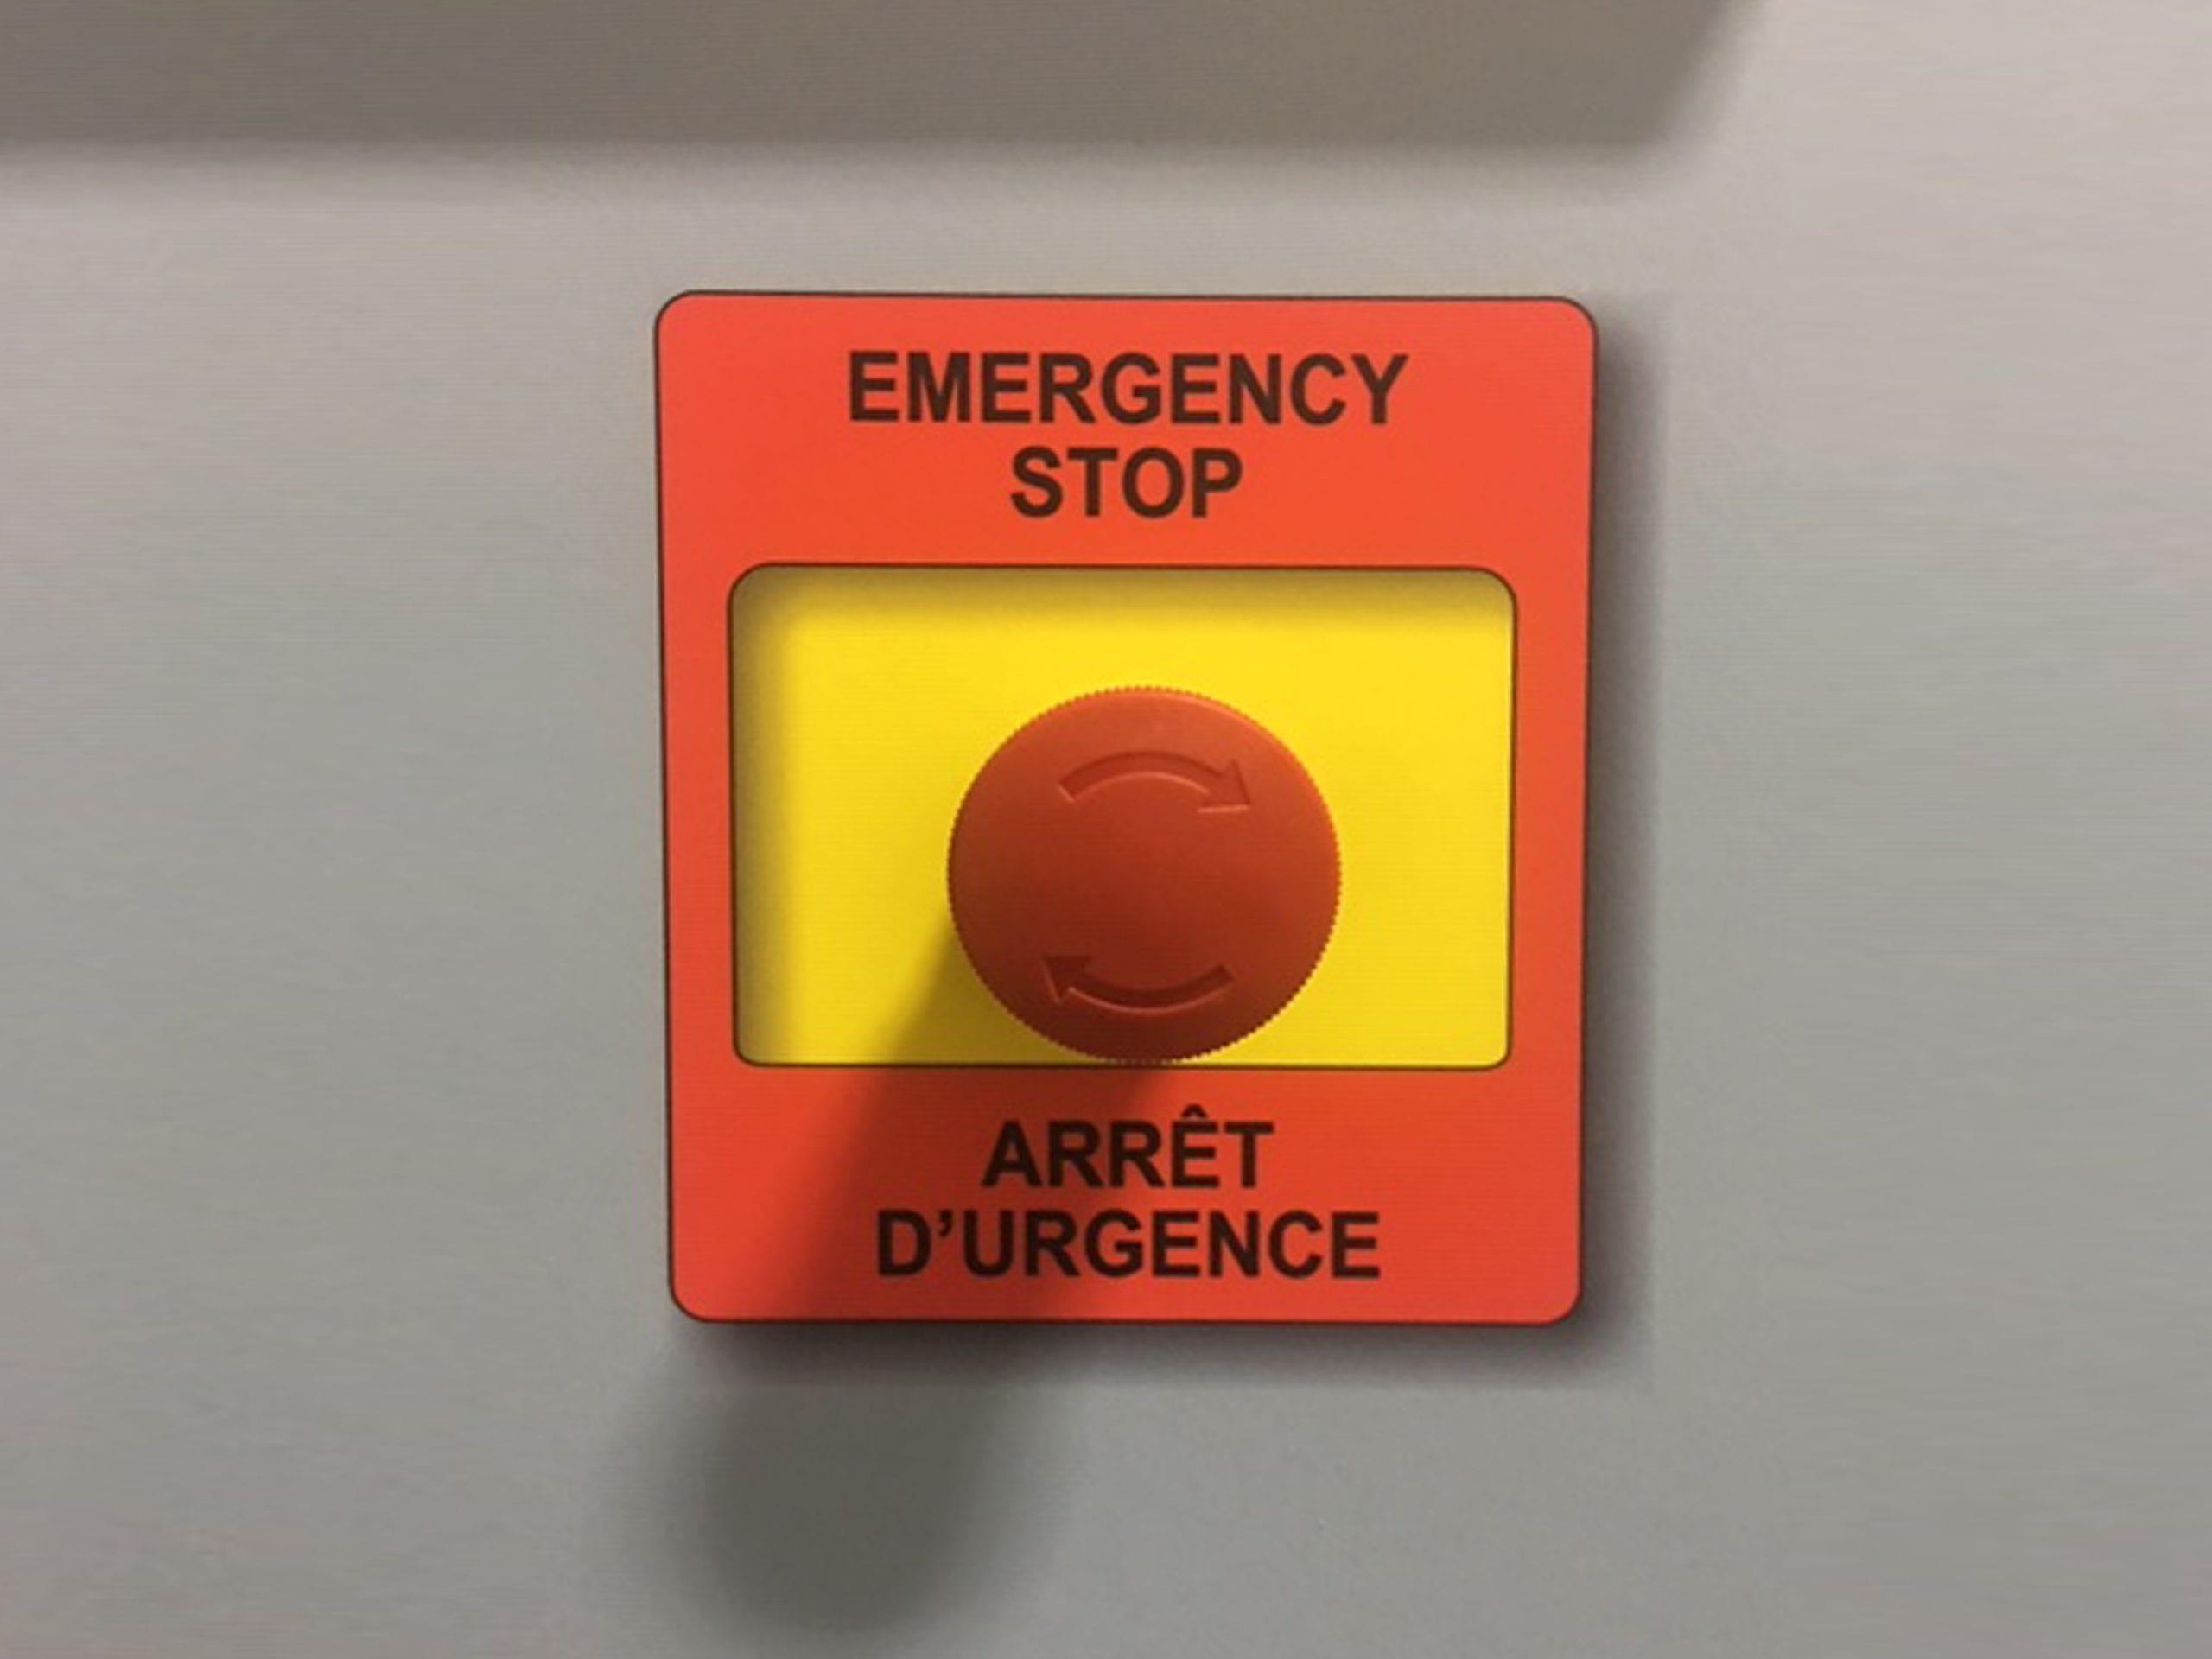 Emergency Stop Button on Sandblast Room Control Panel